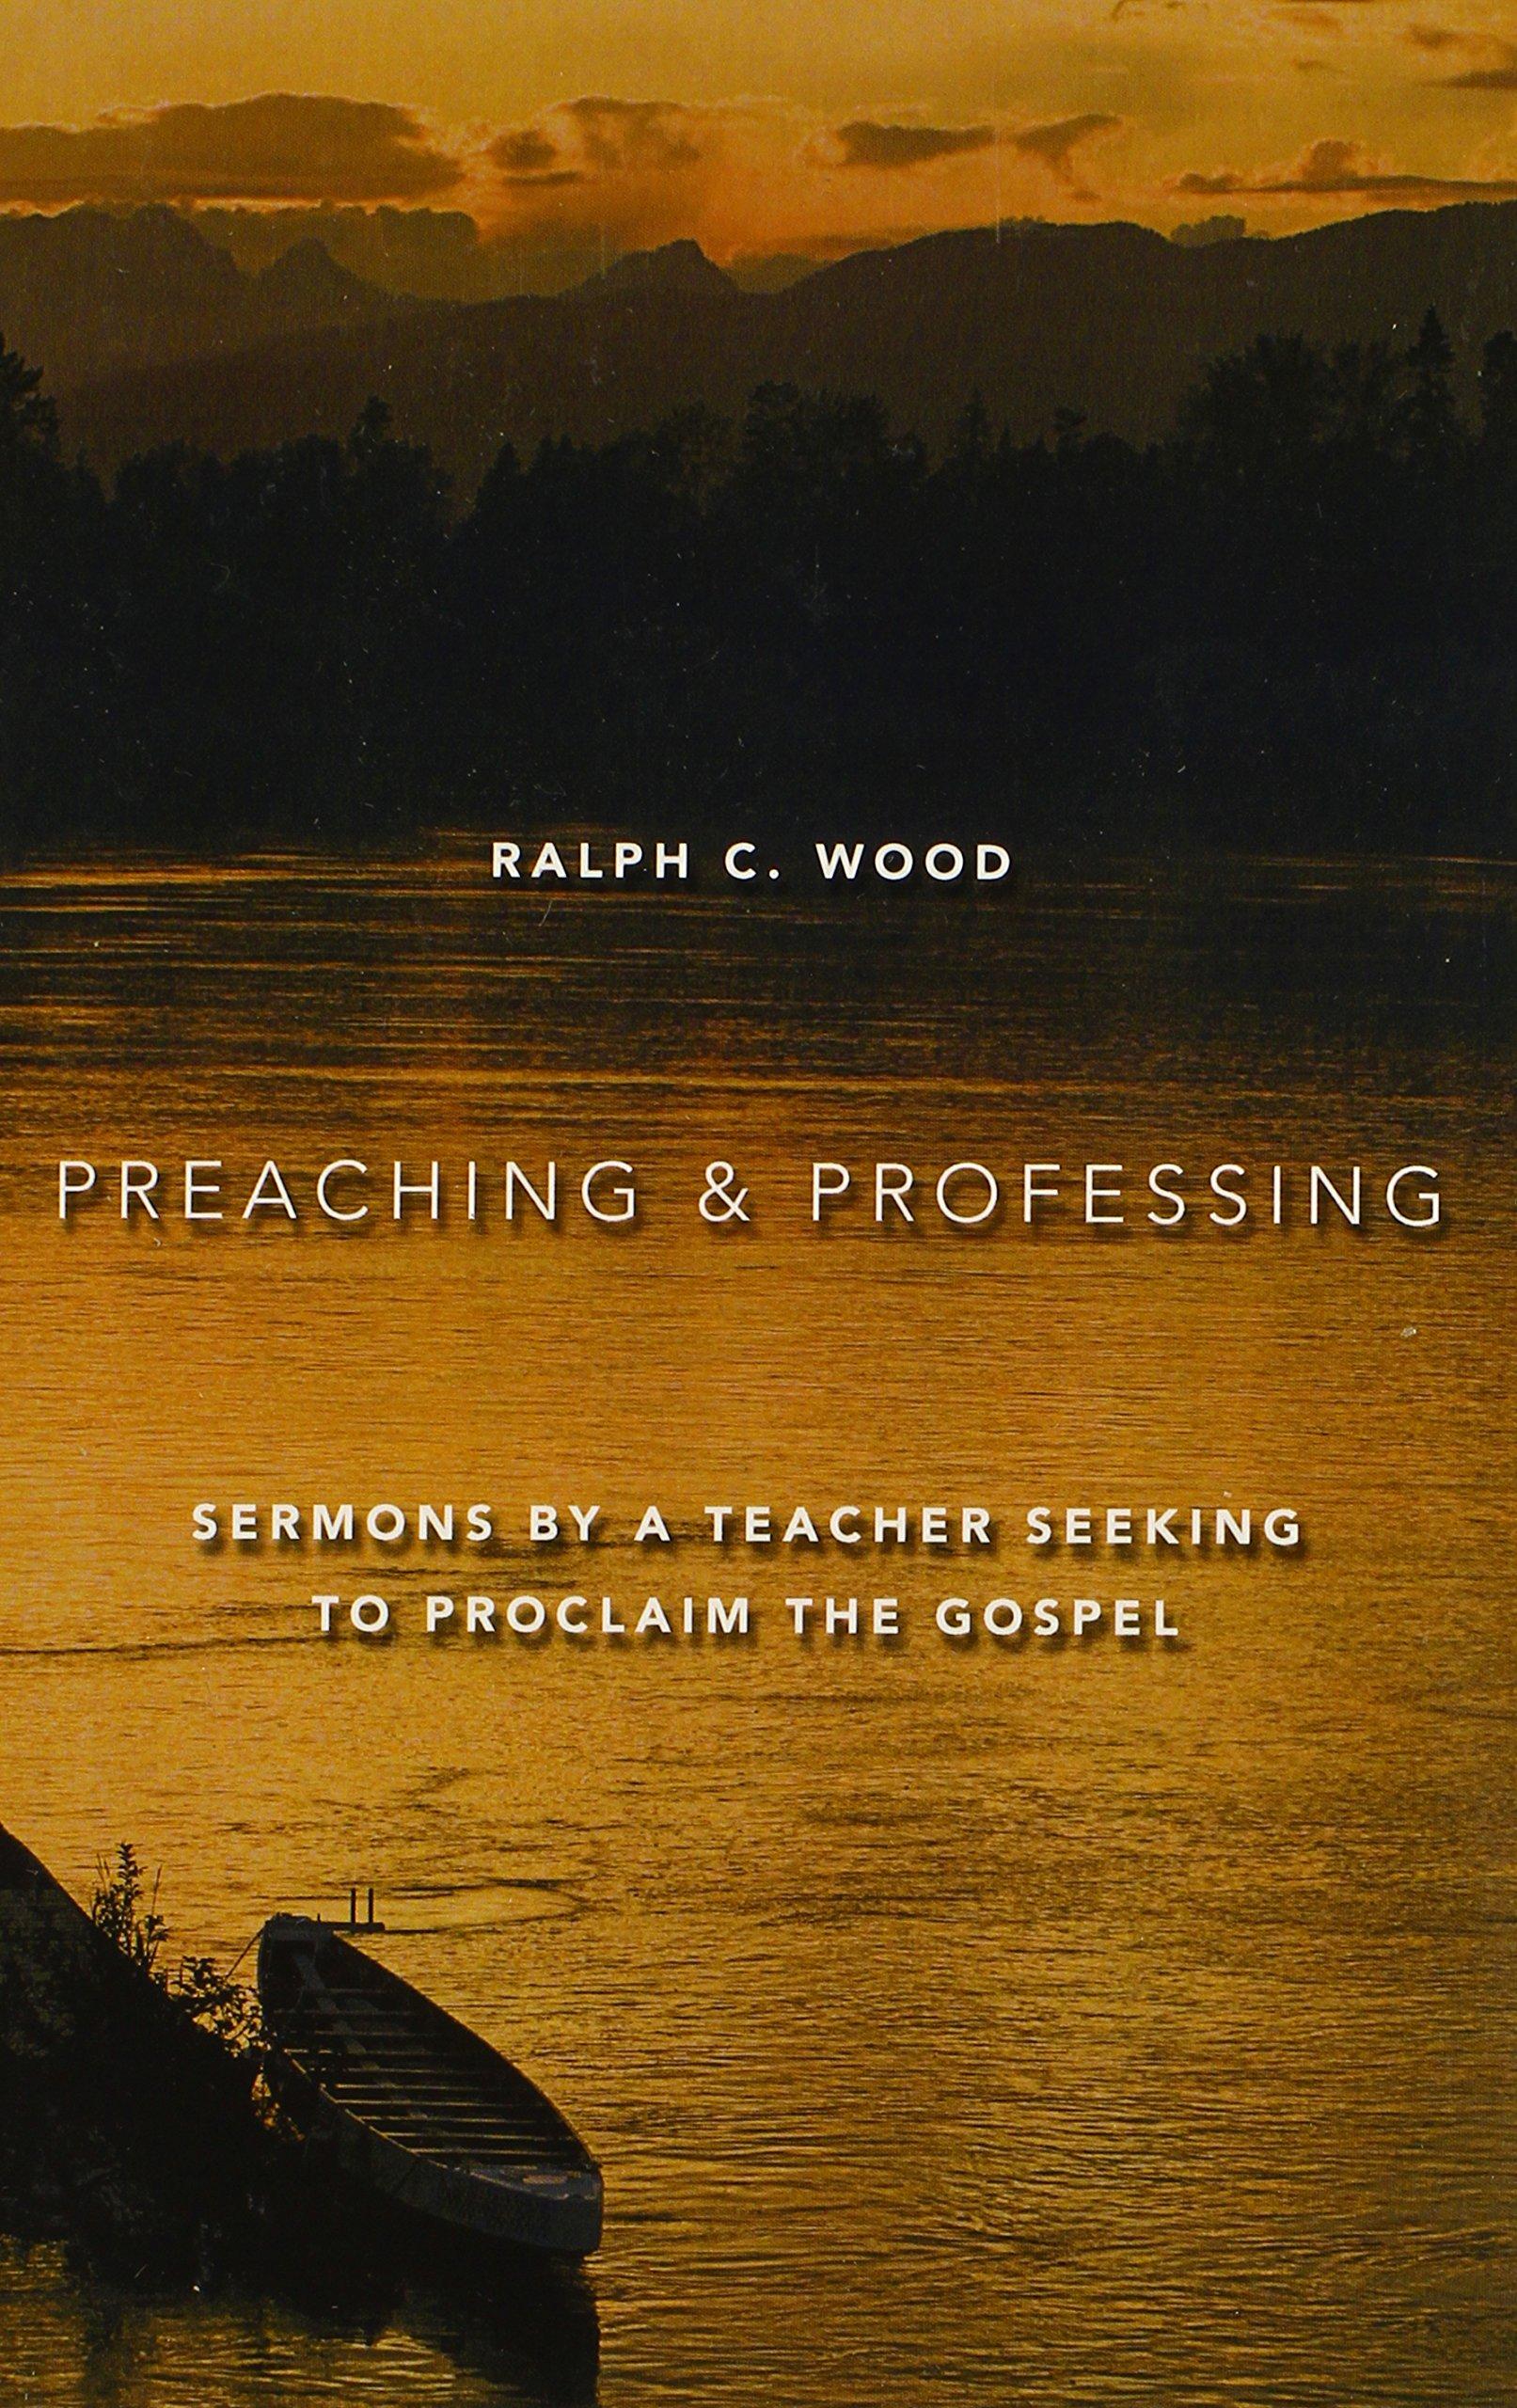 Preaching and Professing: Sermons by a Teacher Seeking to Proclaim